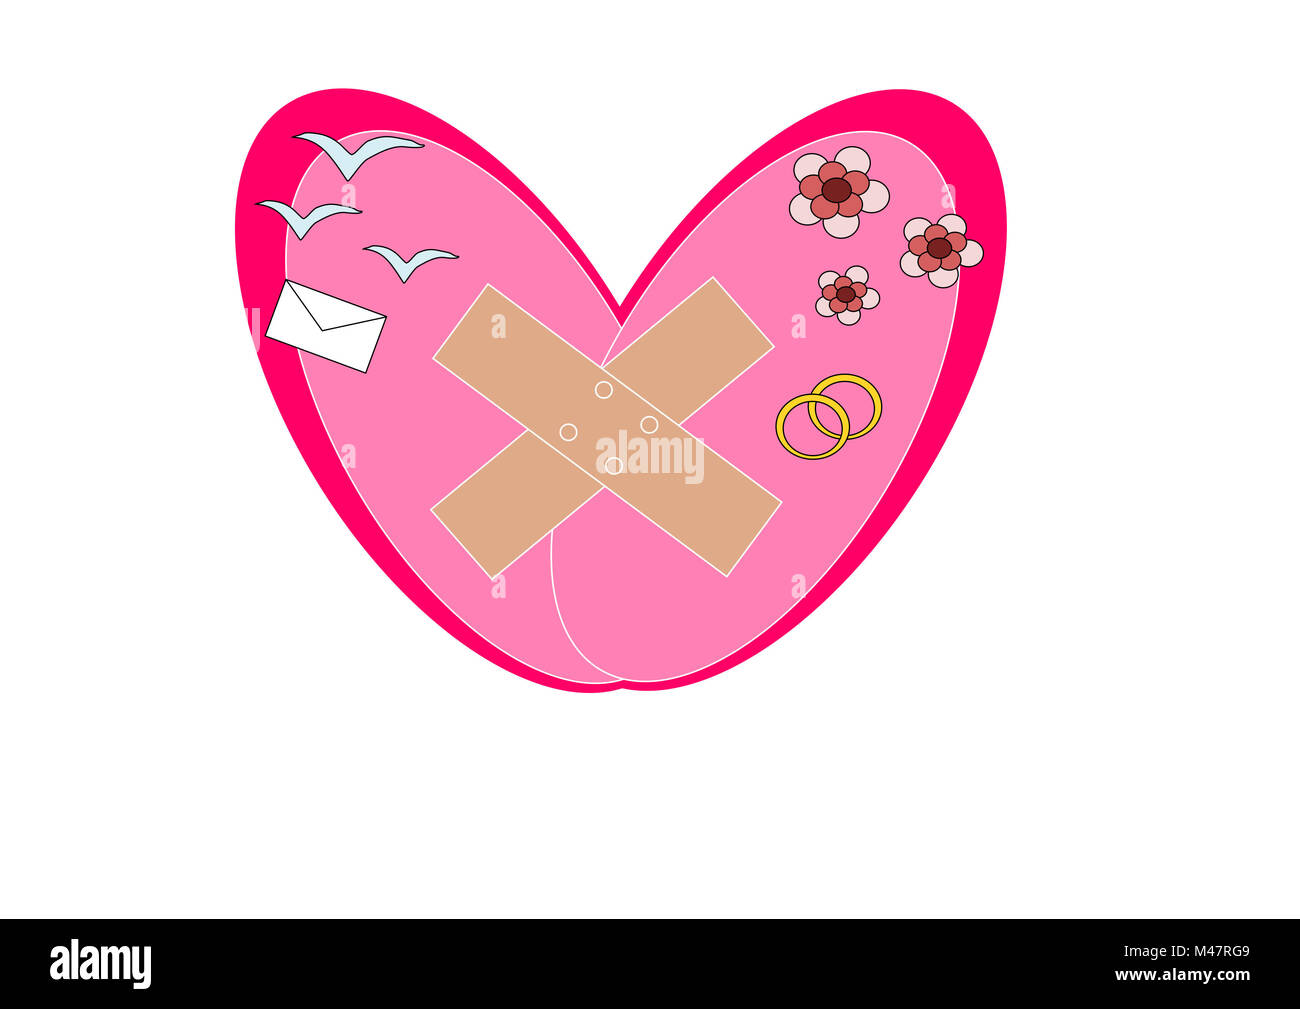 Repaired heart - Stock Image